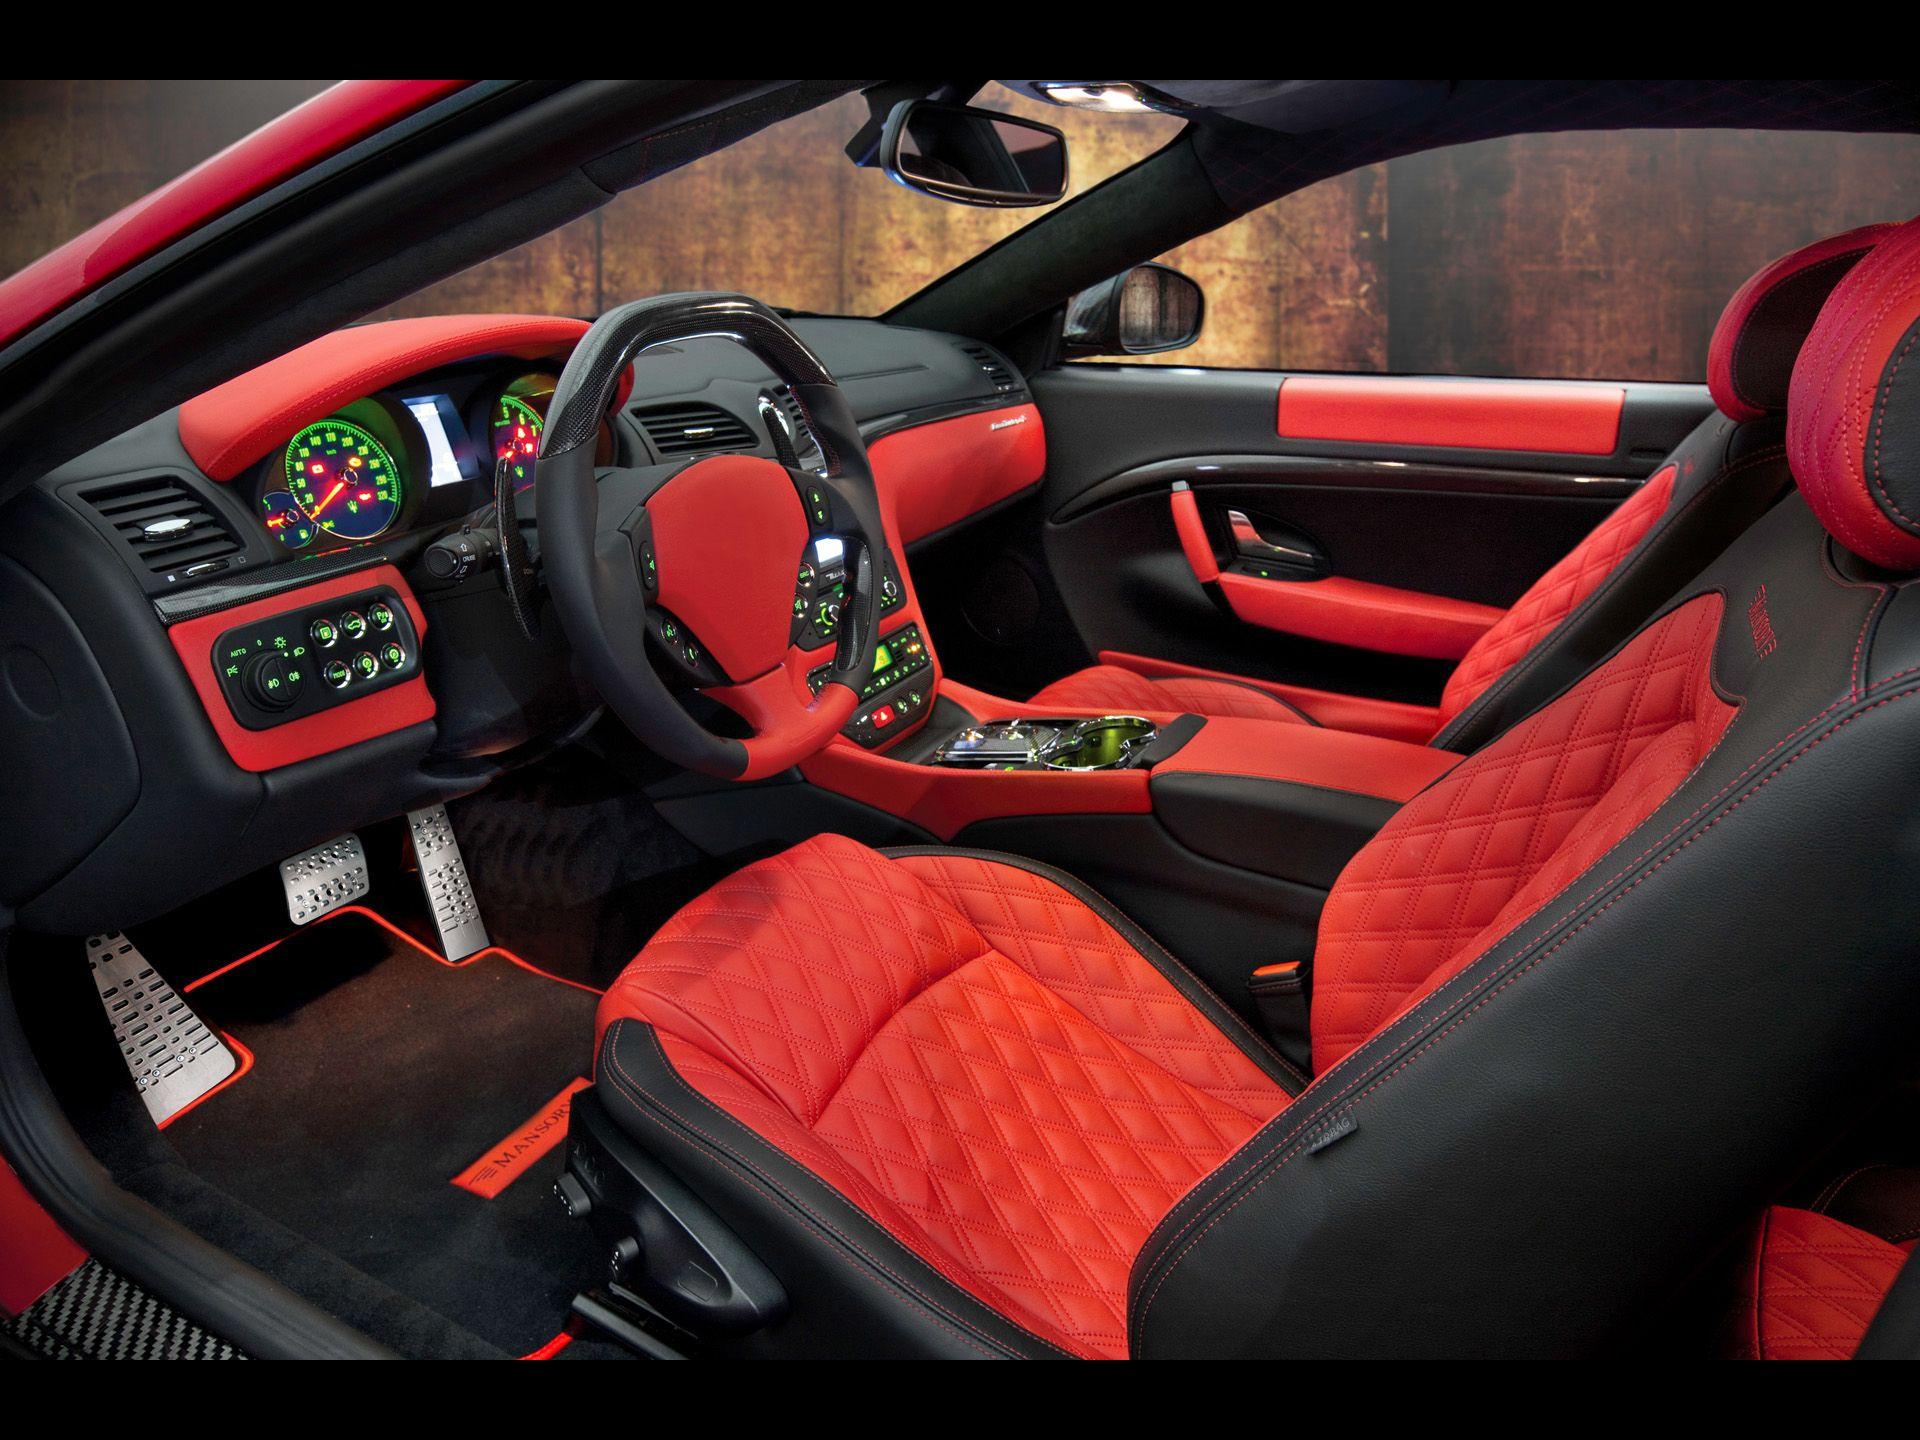 Car interior piping - 2011 Mansory Maserati Granturismo Interior